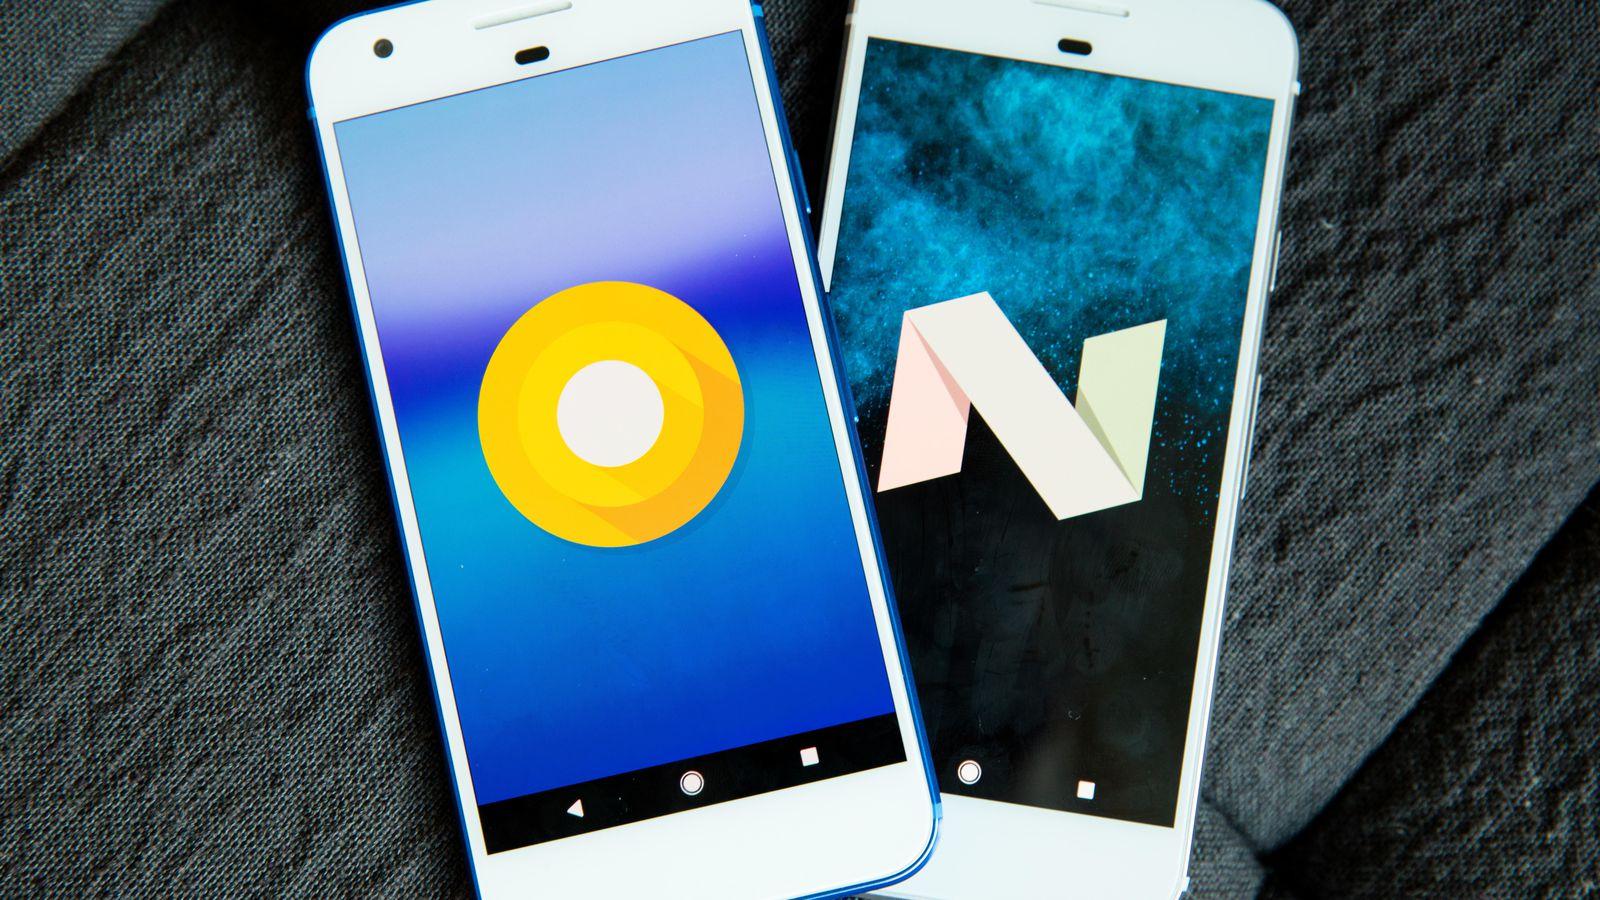 نظام التشغيل Android Oreo